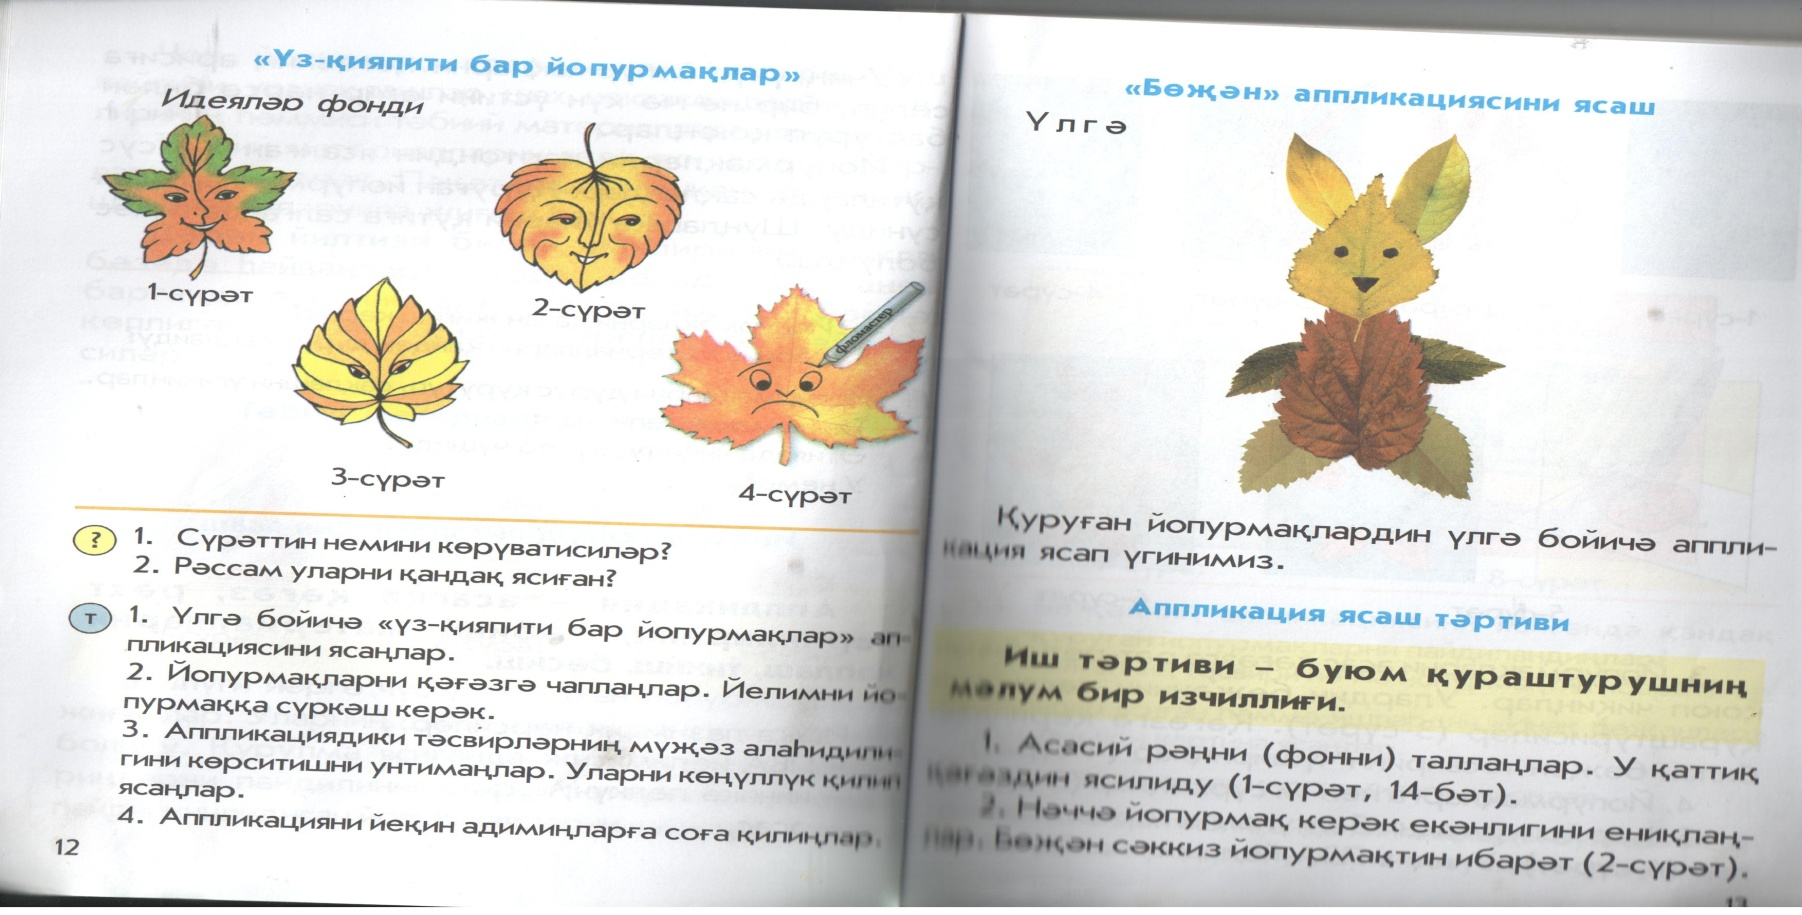 C:\Users\777\Documents\Scanned Documents\Рисунок (53).jpg